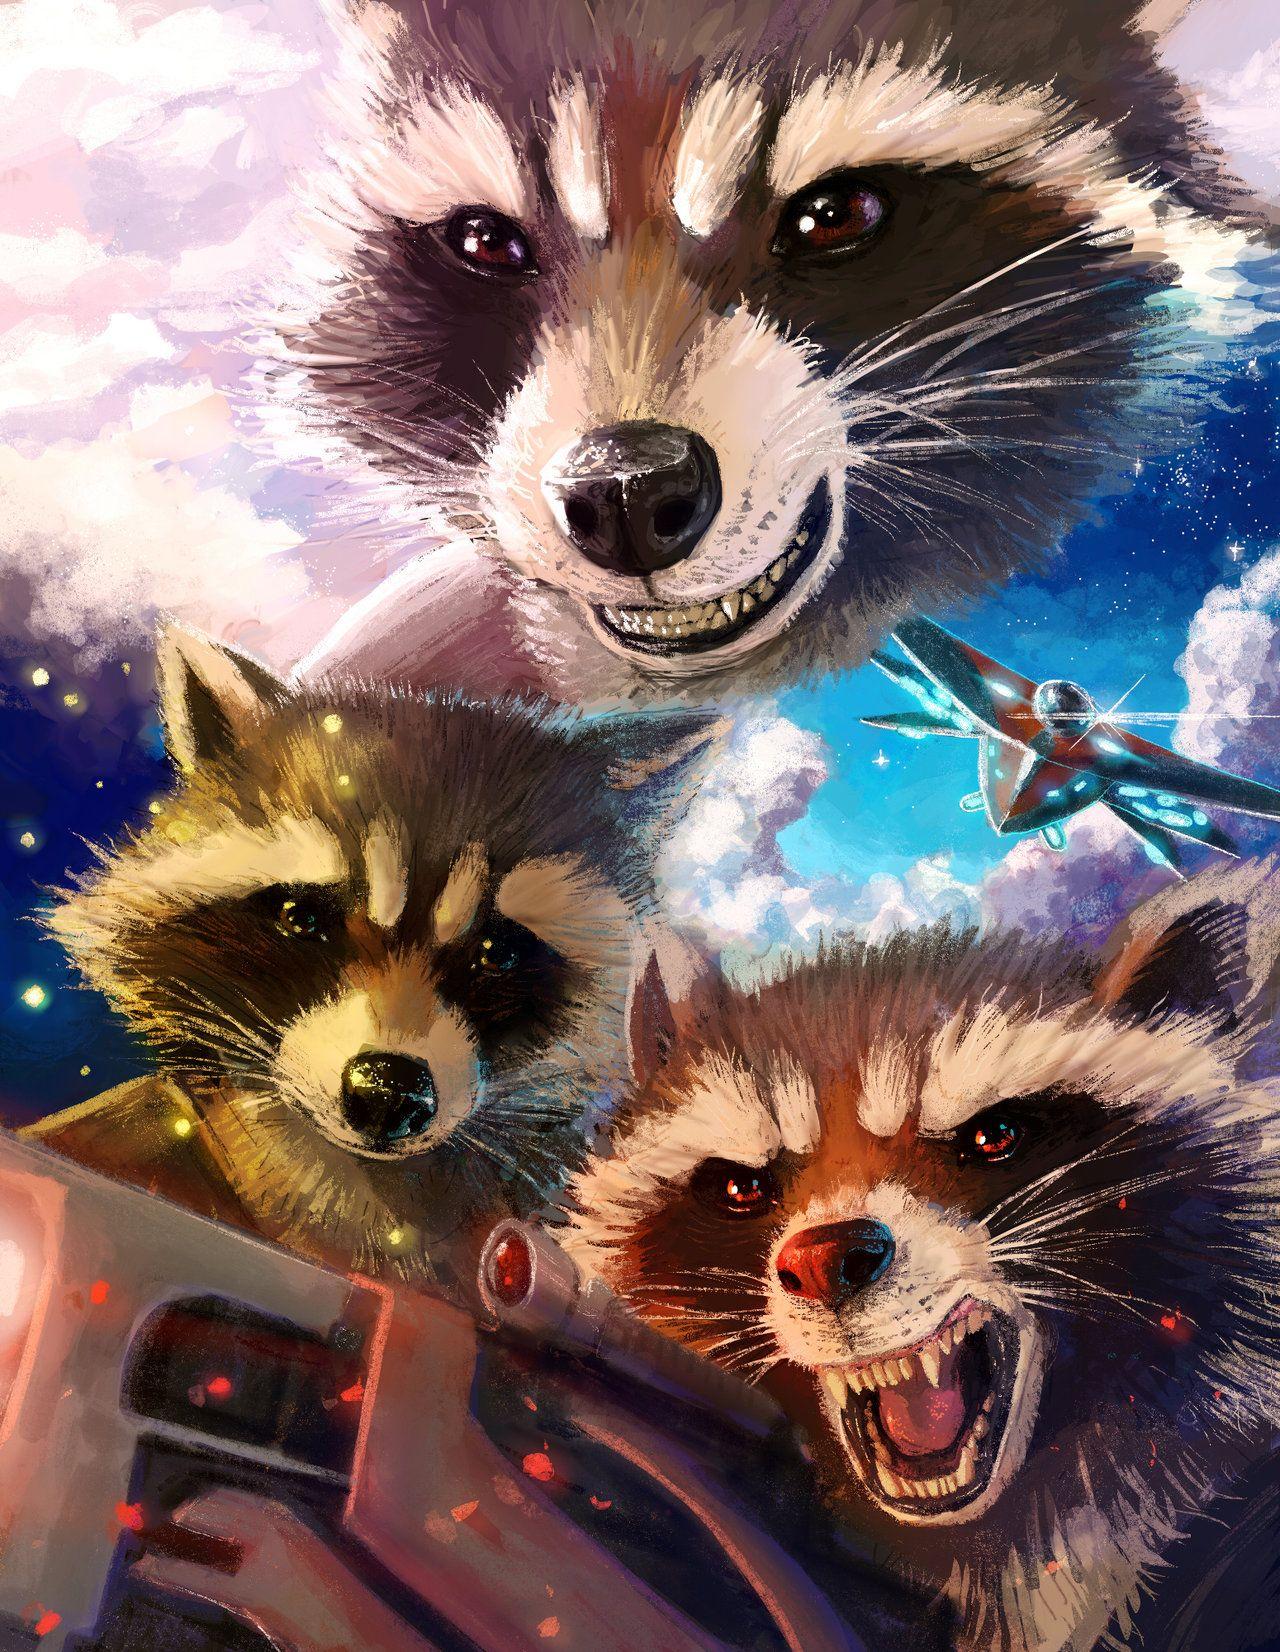 Star Lord And Rocket Raccoon By Timothygreenii On Deviantart: Rocket Raccoon Montage By SoihtuSS.deviantart.com On